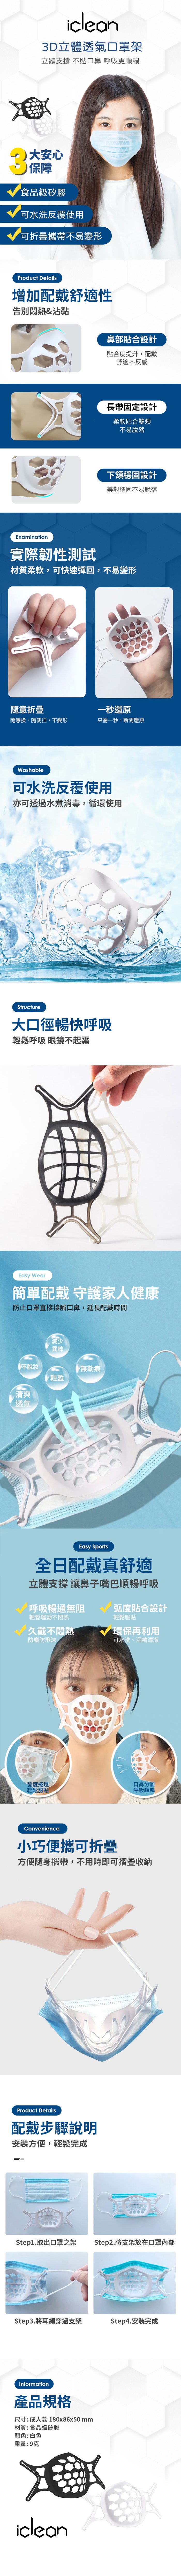 iClean|3D立體透氣口罩架 白色 - 二十入組